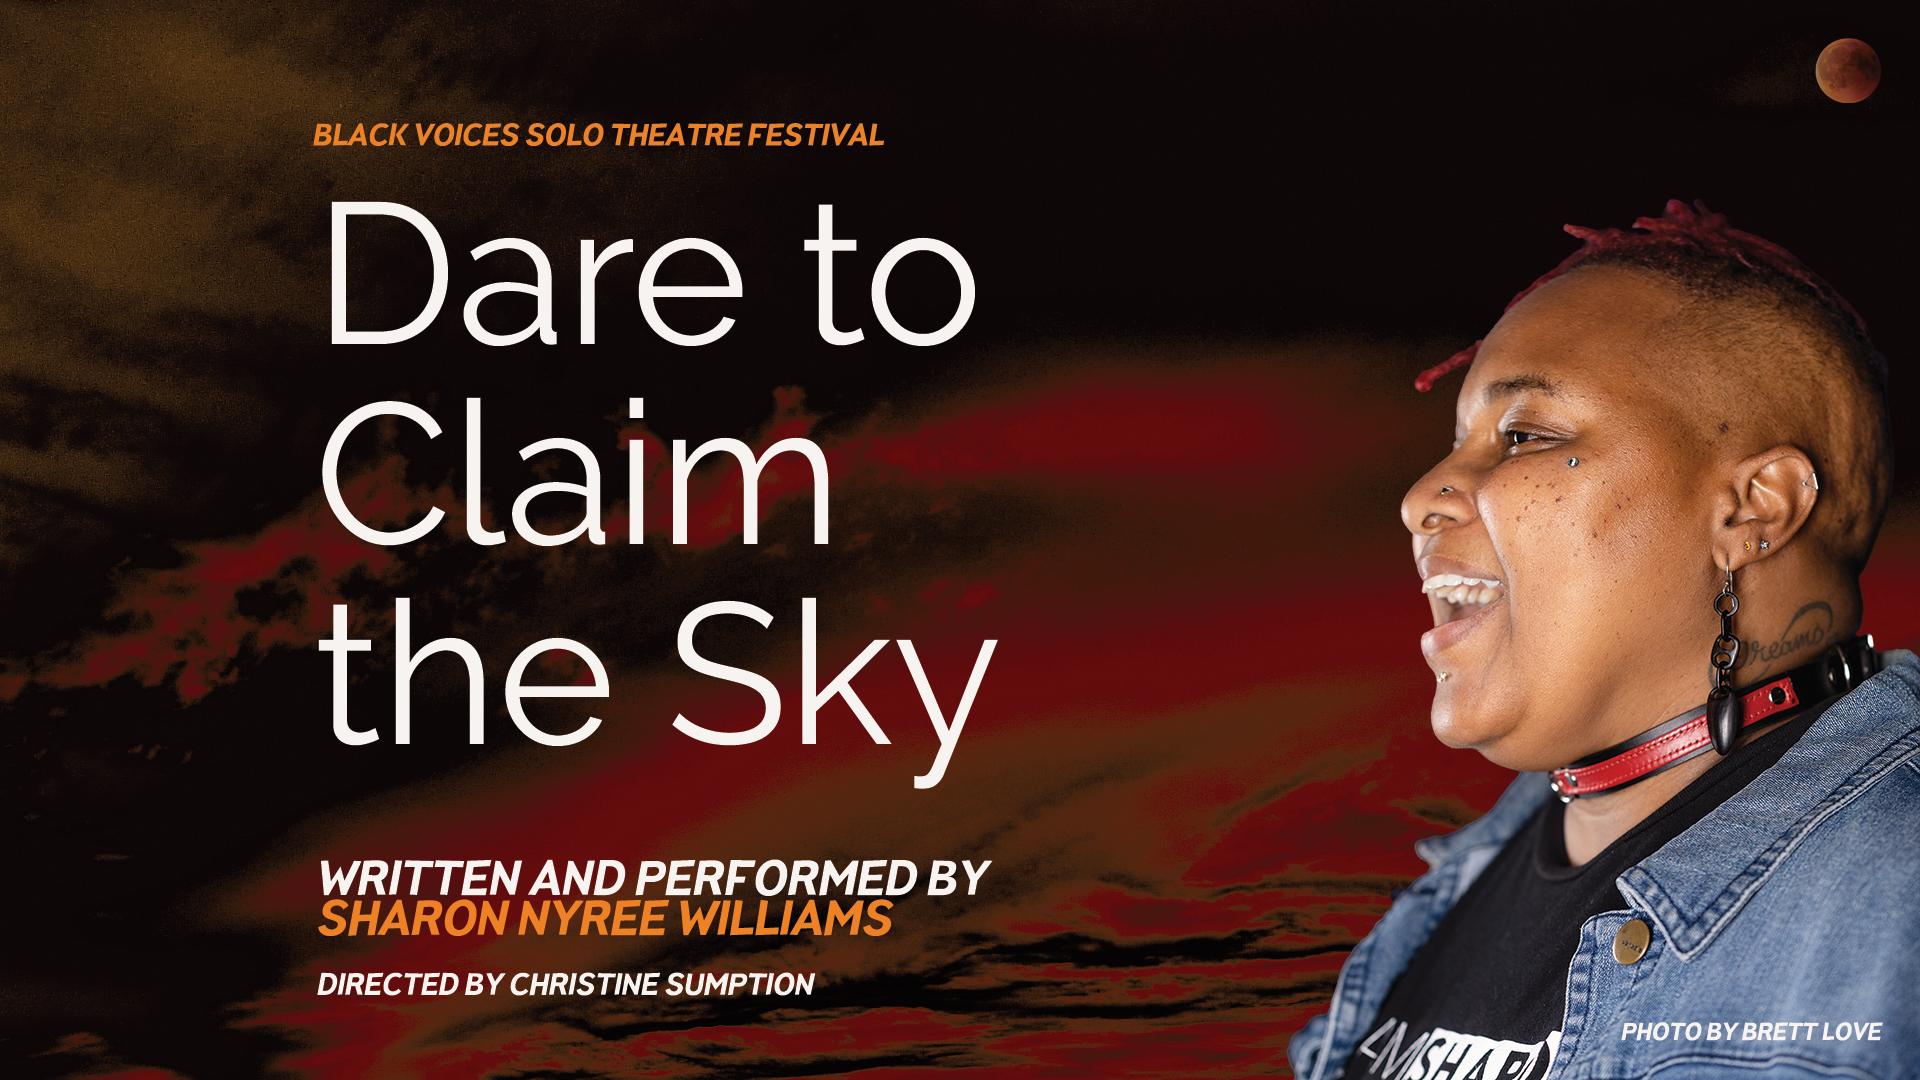 Dare to Claim the Sky Feb 6 @ 7pm PST